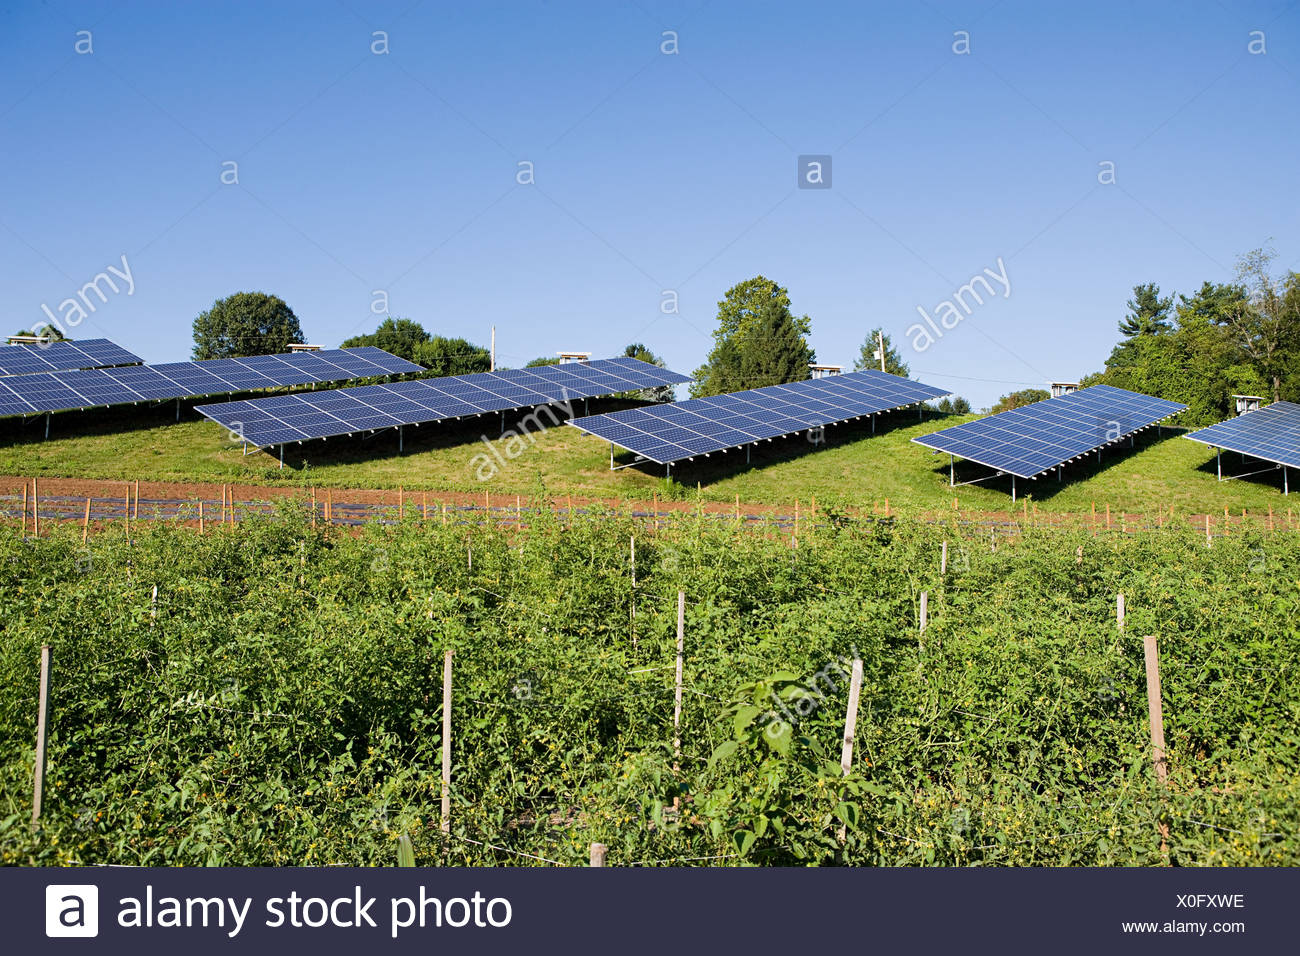 Solar panels in field, Pennsylvania - Stock Image